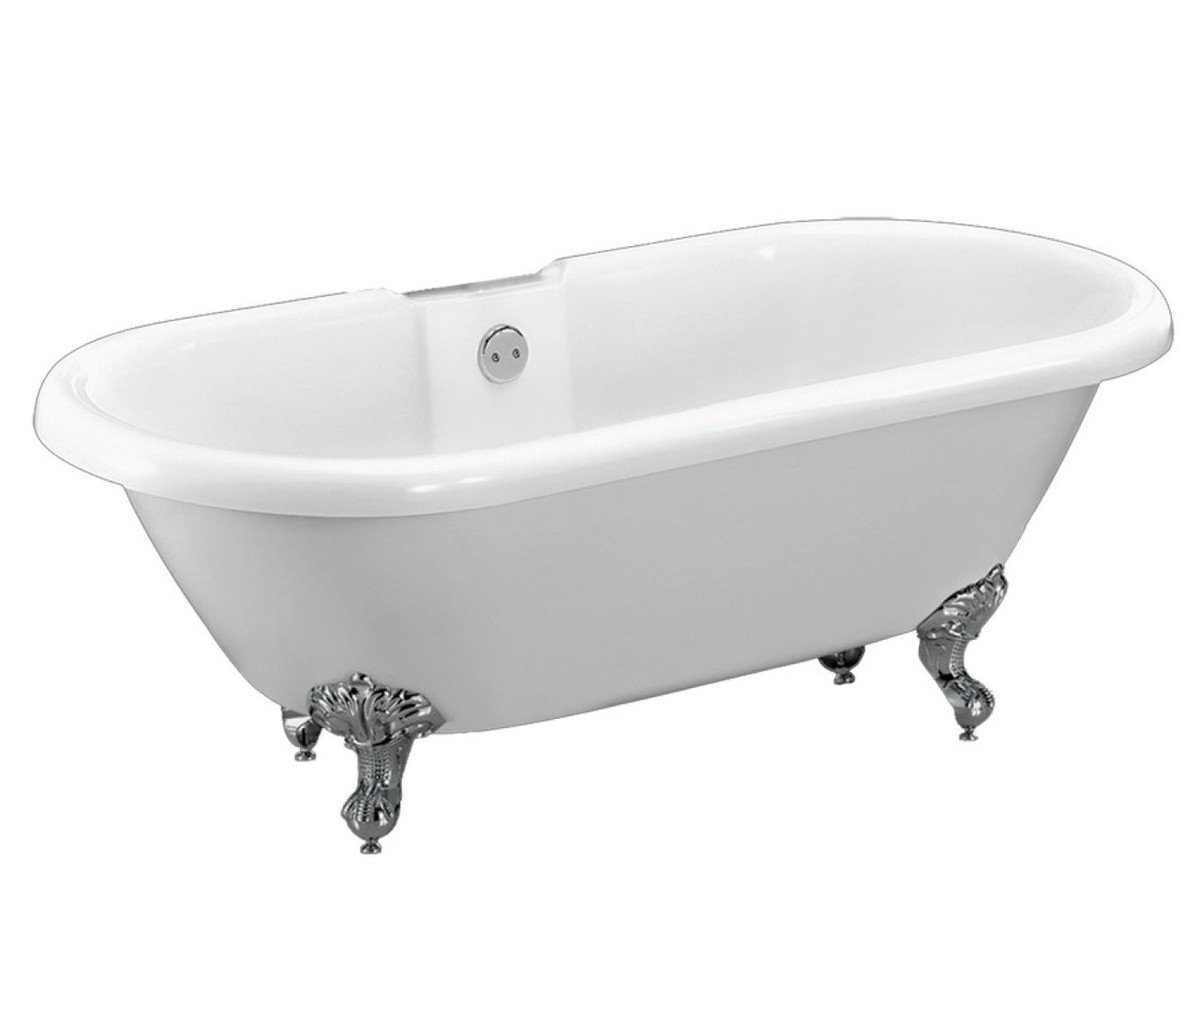 Dual Traditional Rolltop Freestanding Bath including Chrome Feet